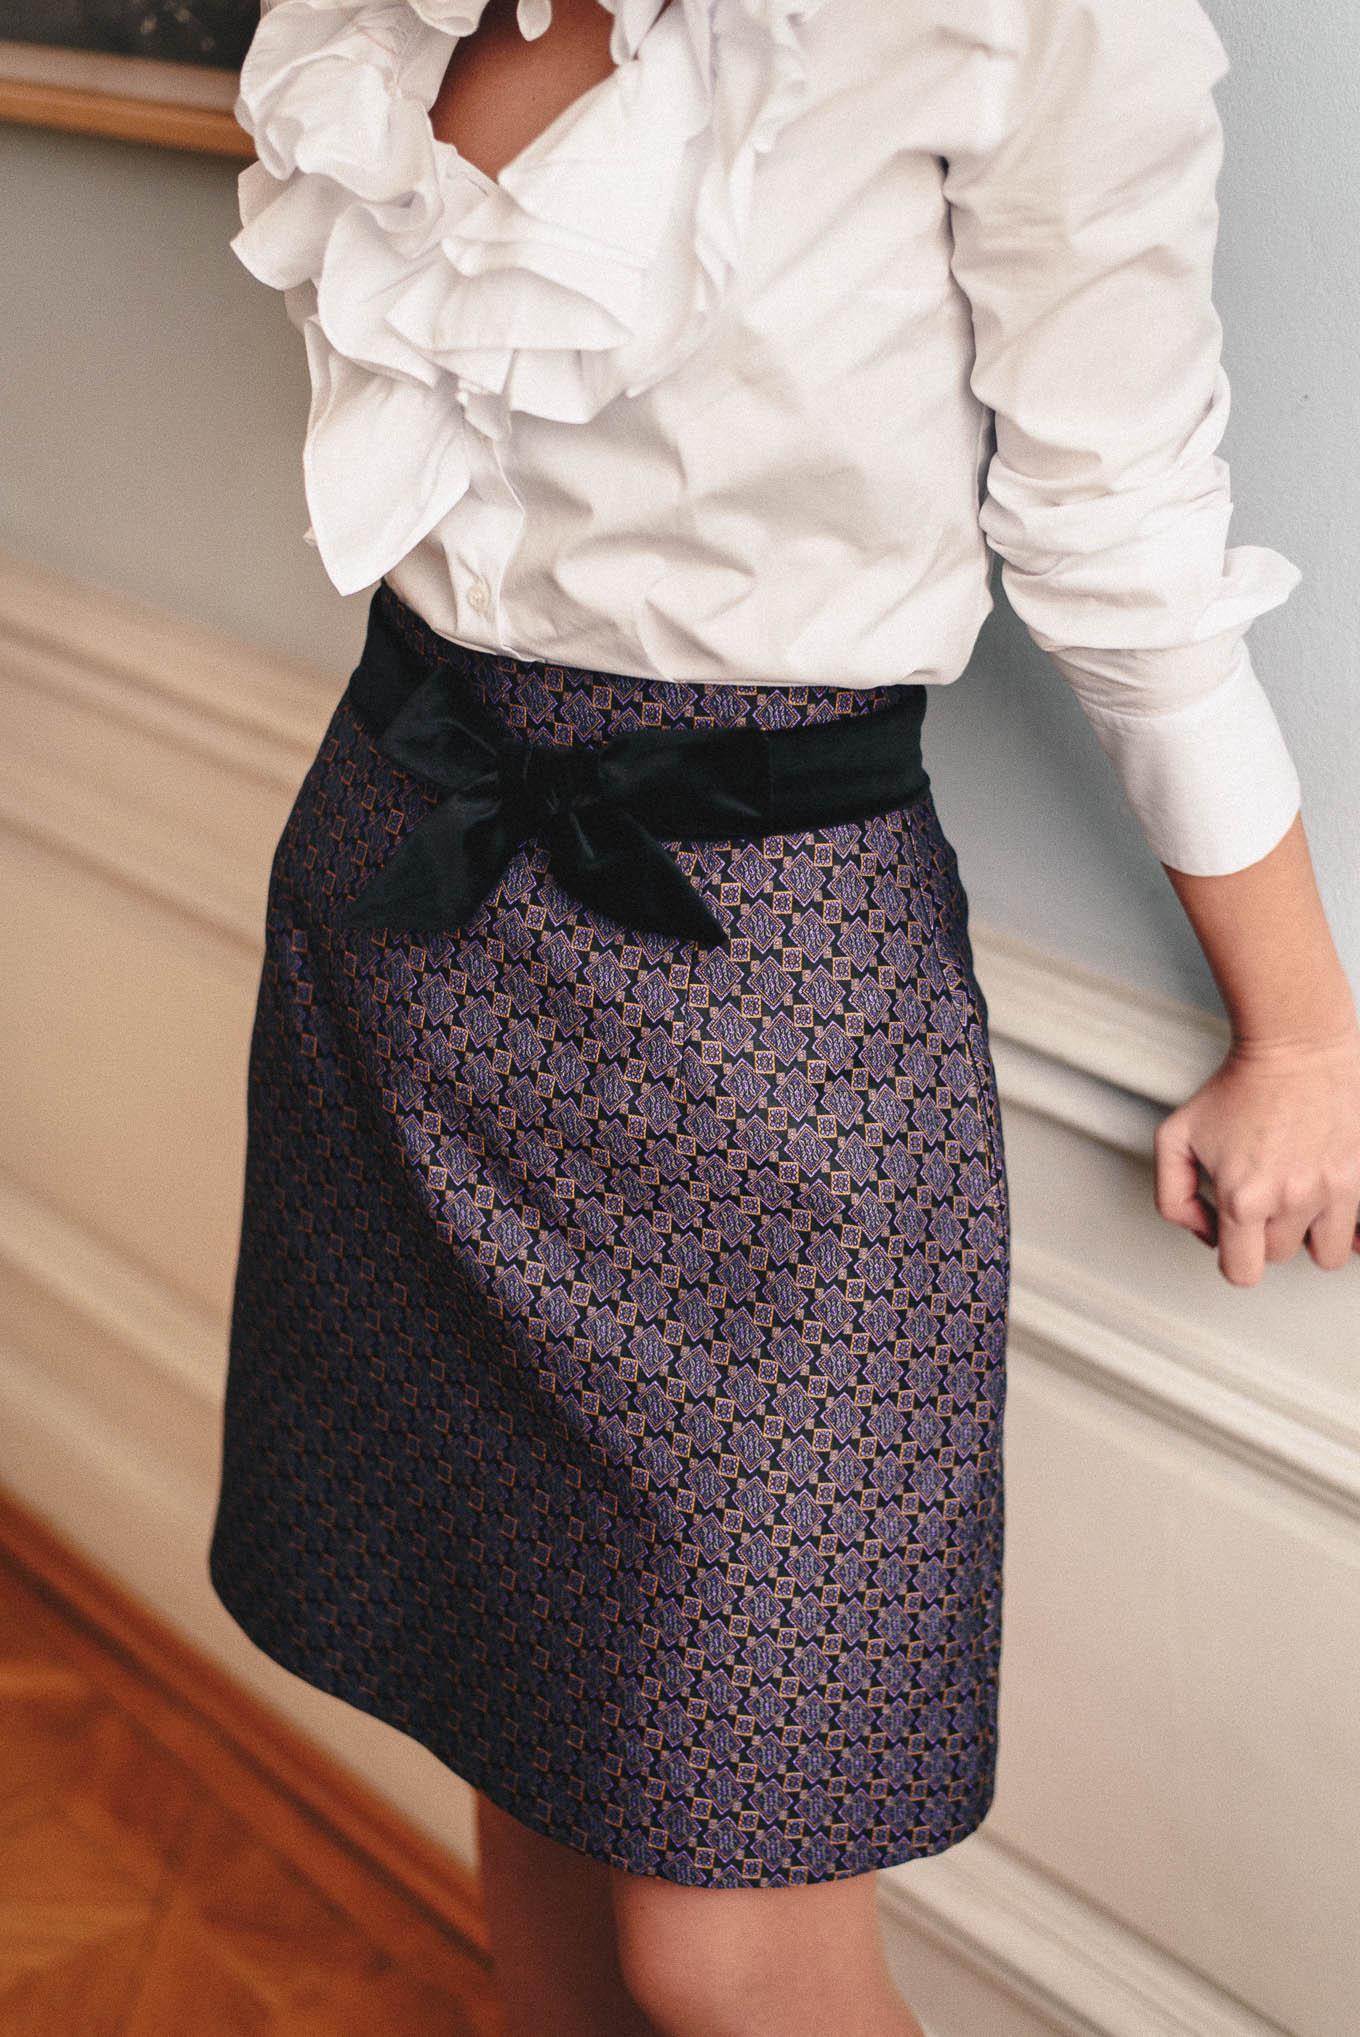 jacquard skirt by Denina Martin